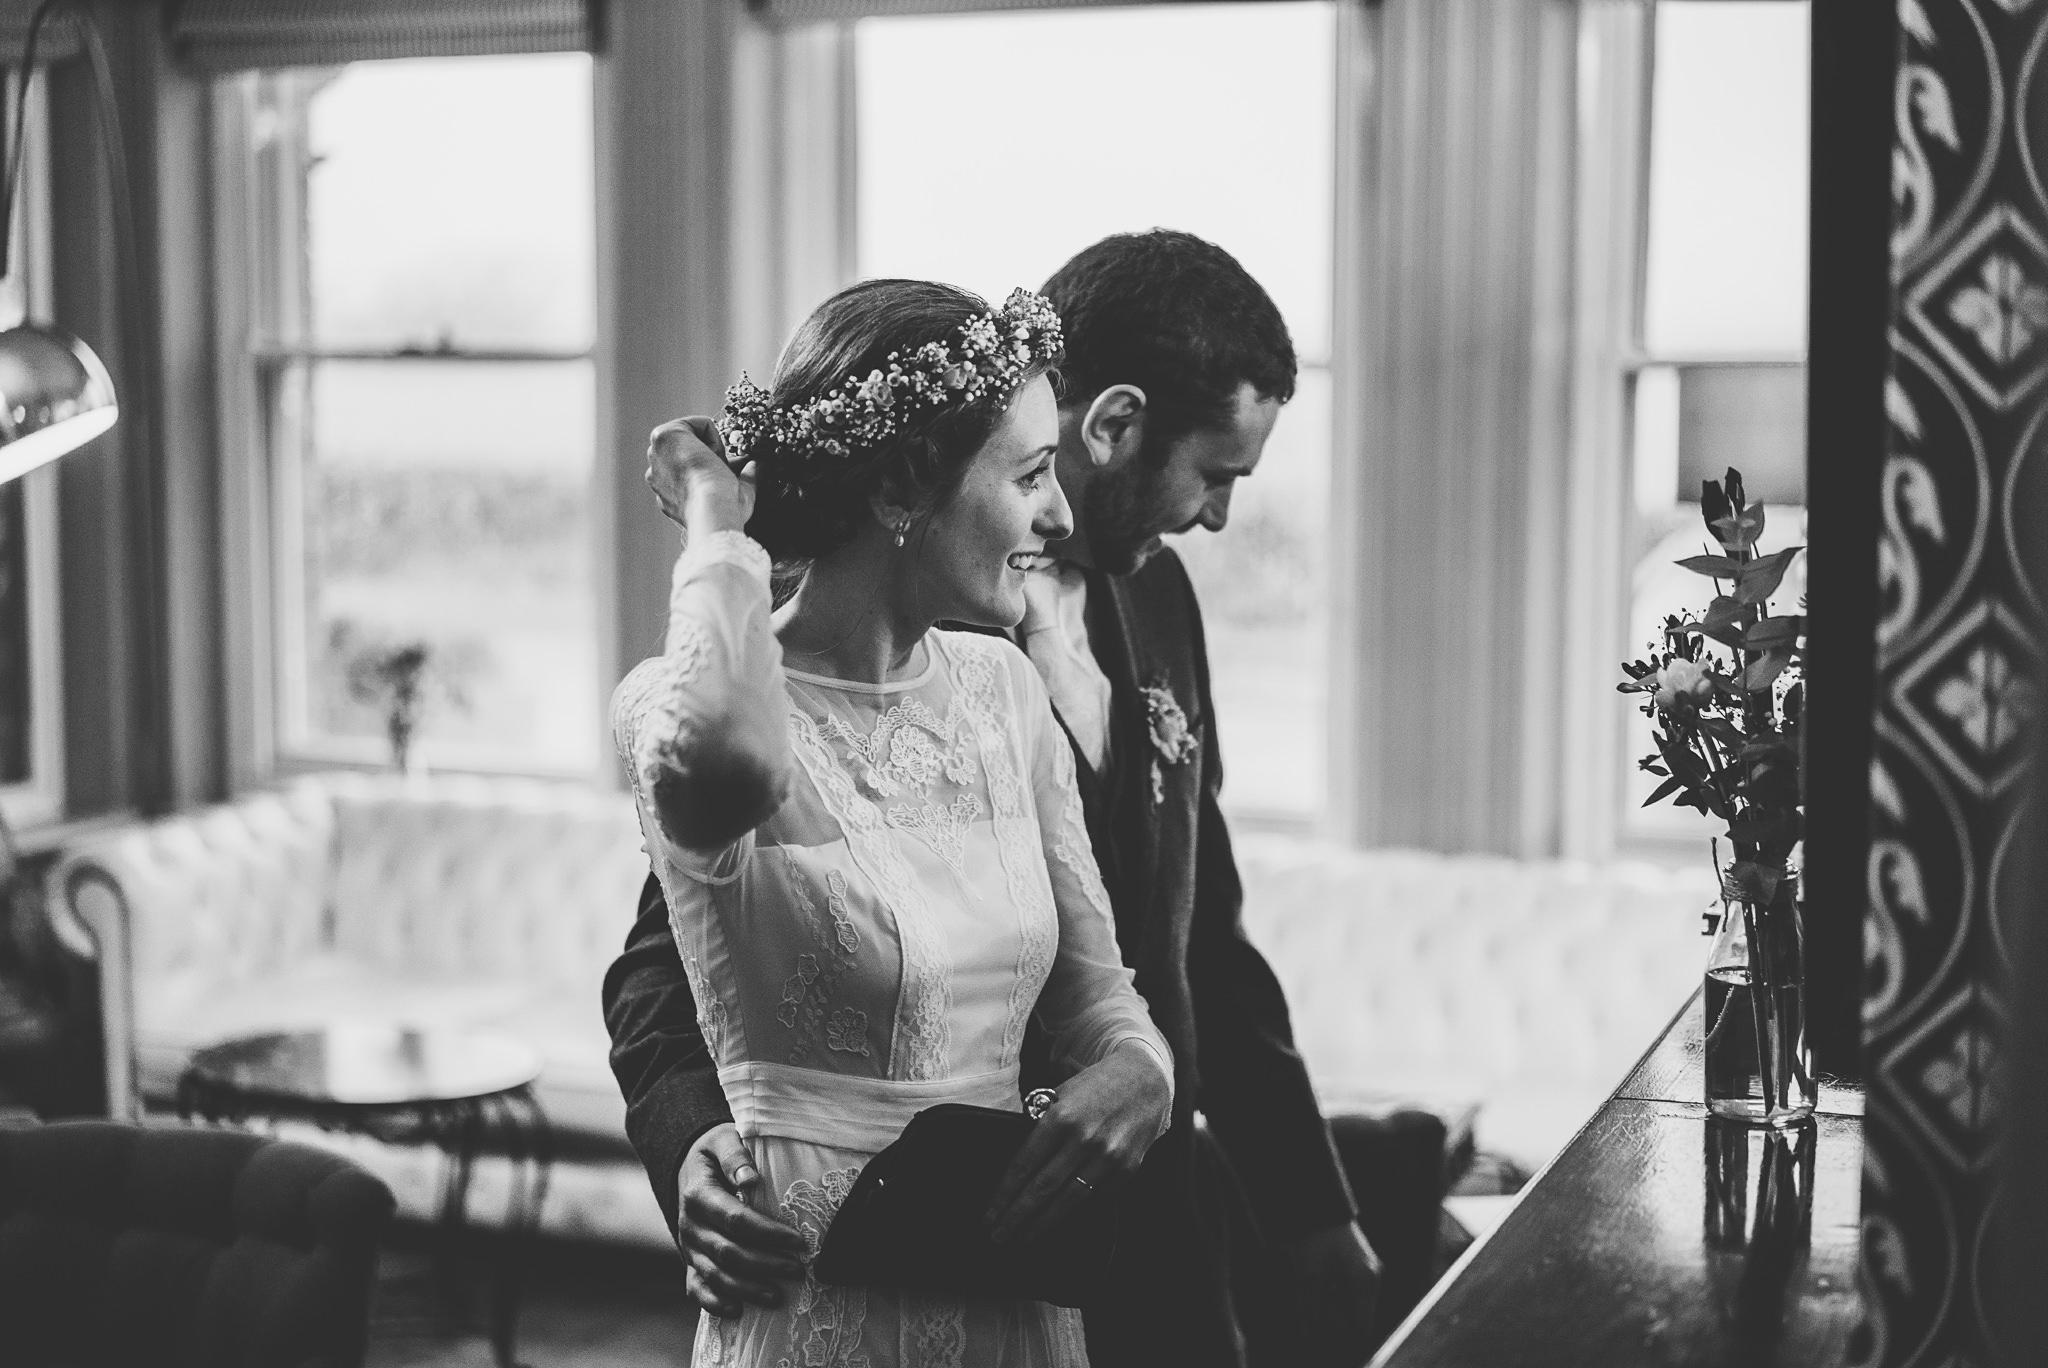 Creative-reportage-wedding-photography-90032